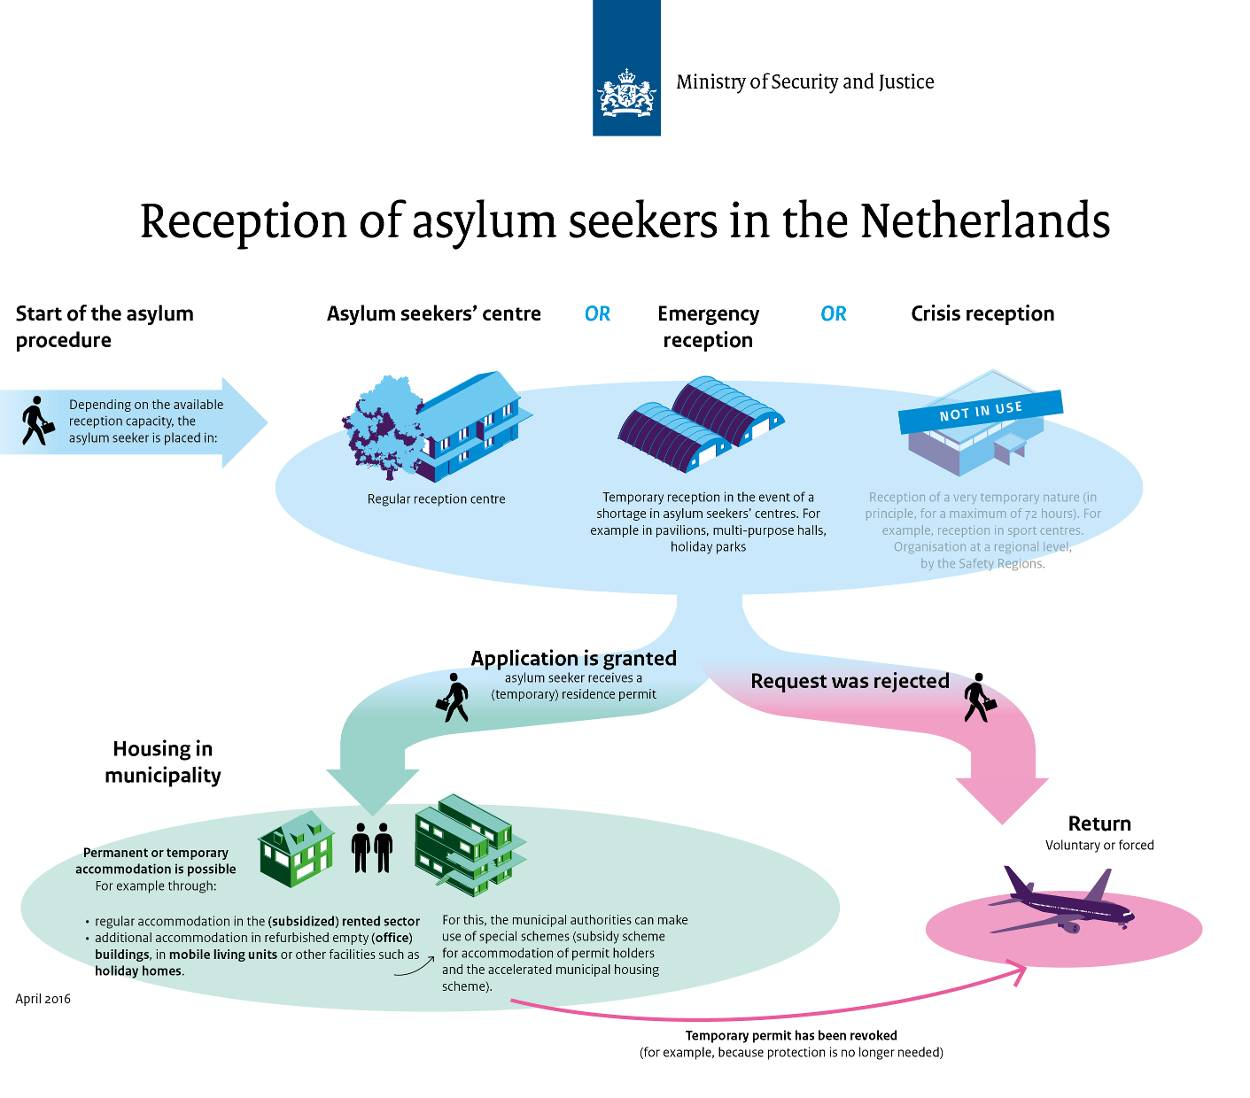 Reception of asylum seekers in the Netherlands | Asylum